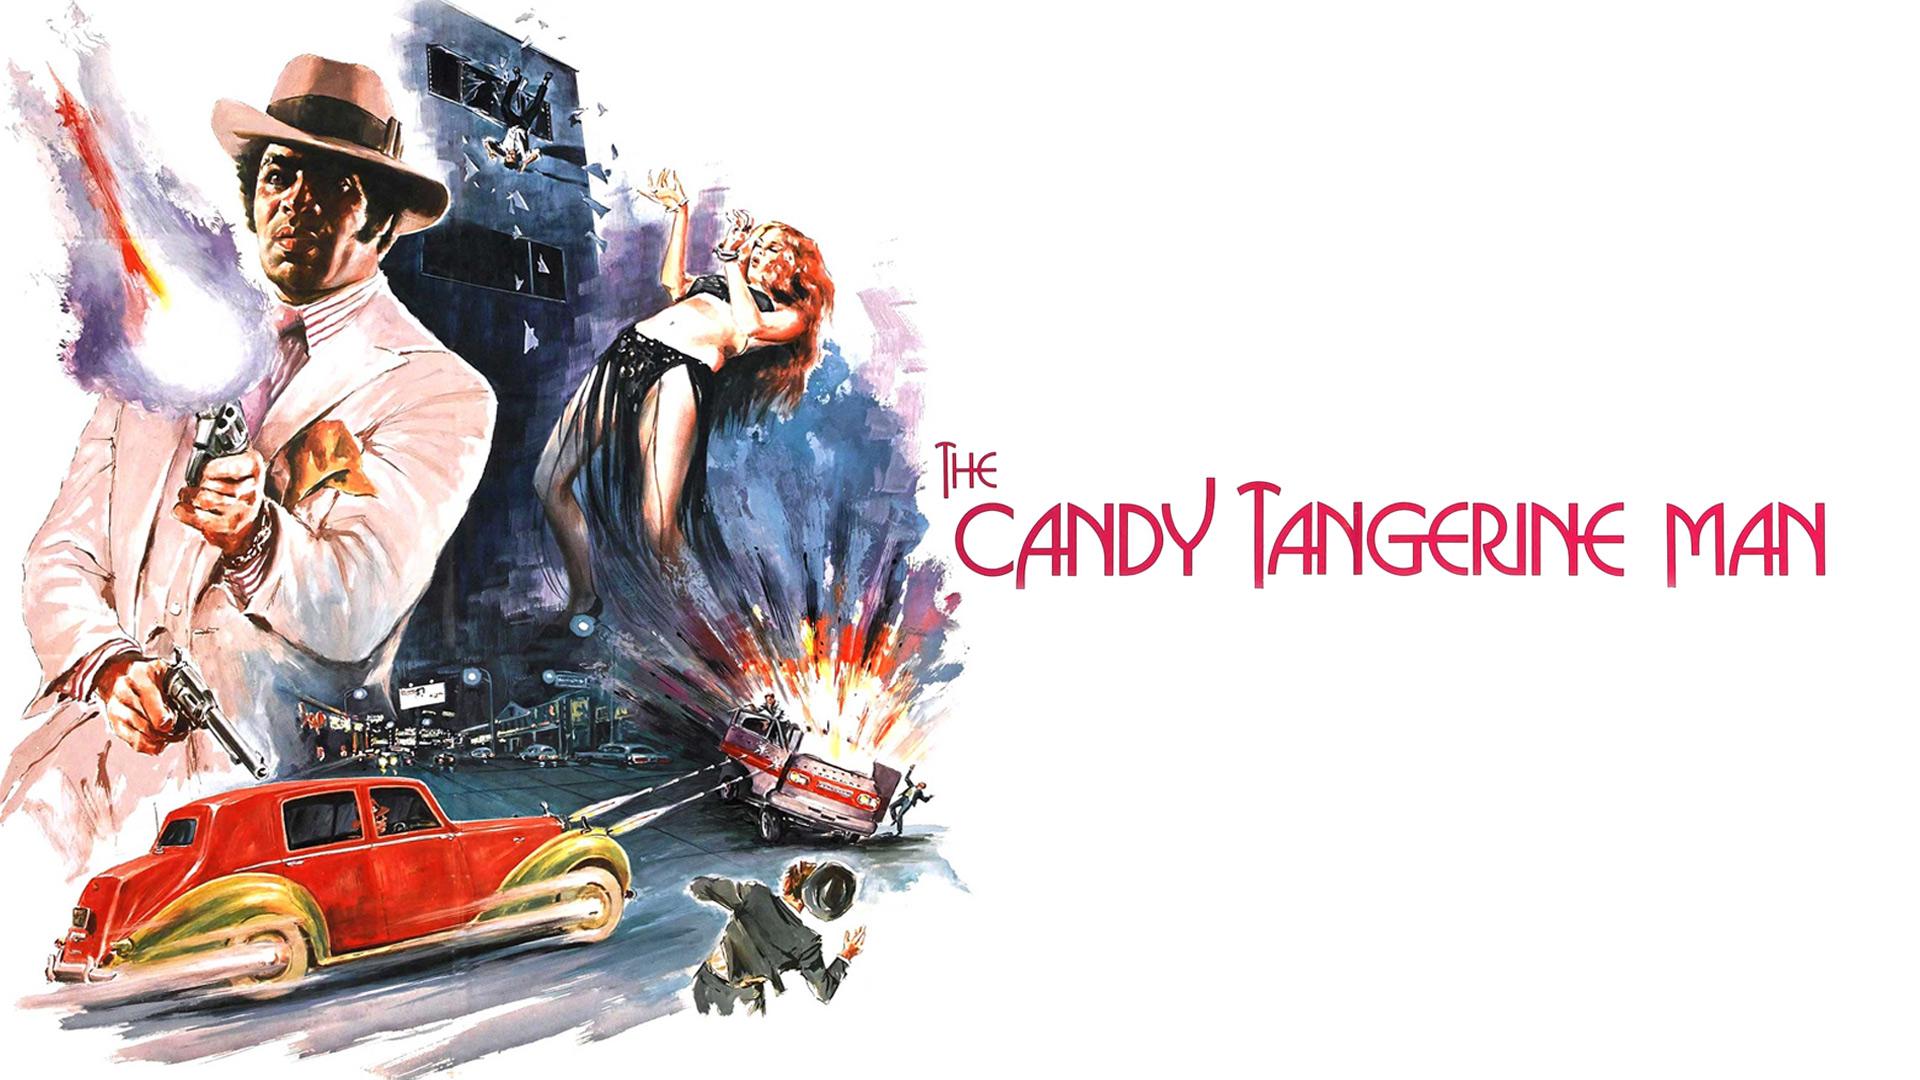 Candy Tangerine Man